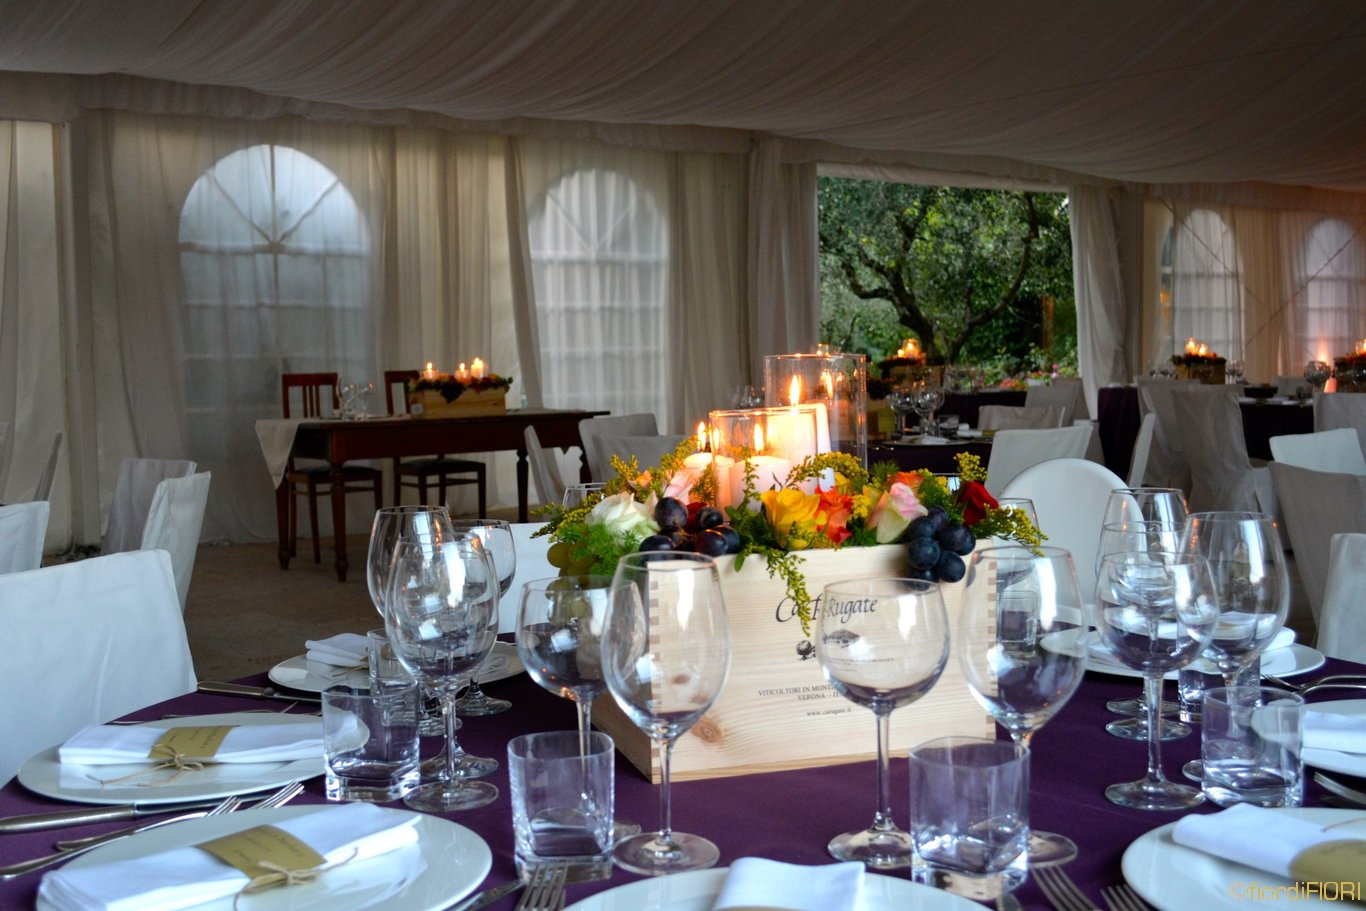 Matrimonio Tema Vino : Fiordifiori matrimonio tema vino